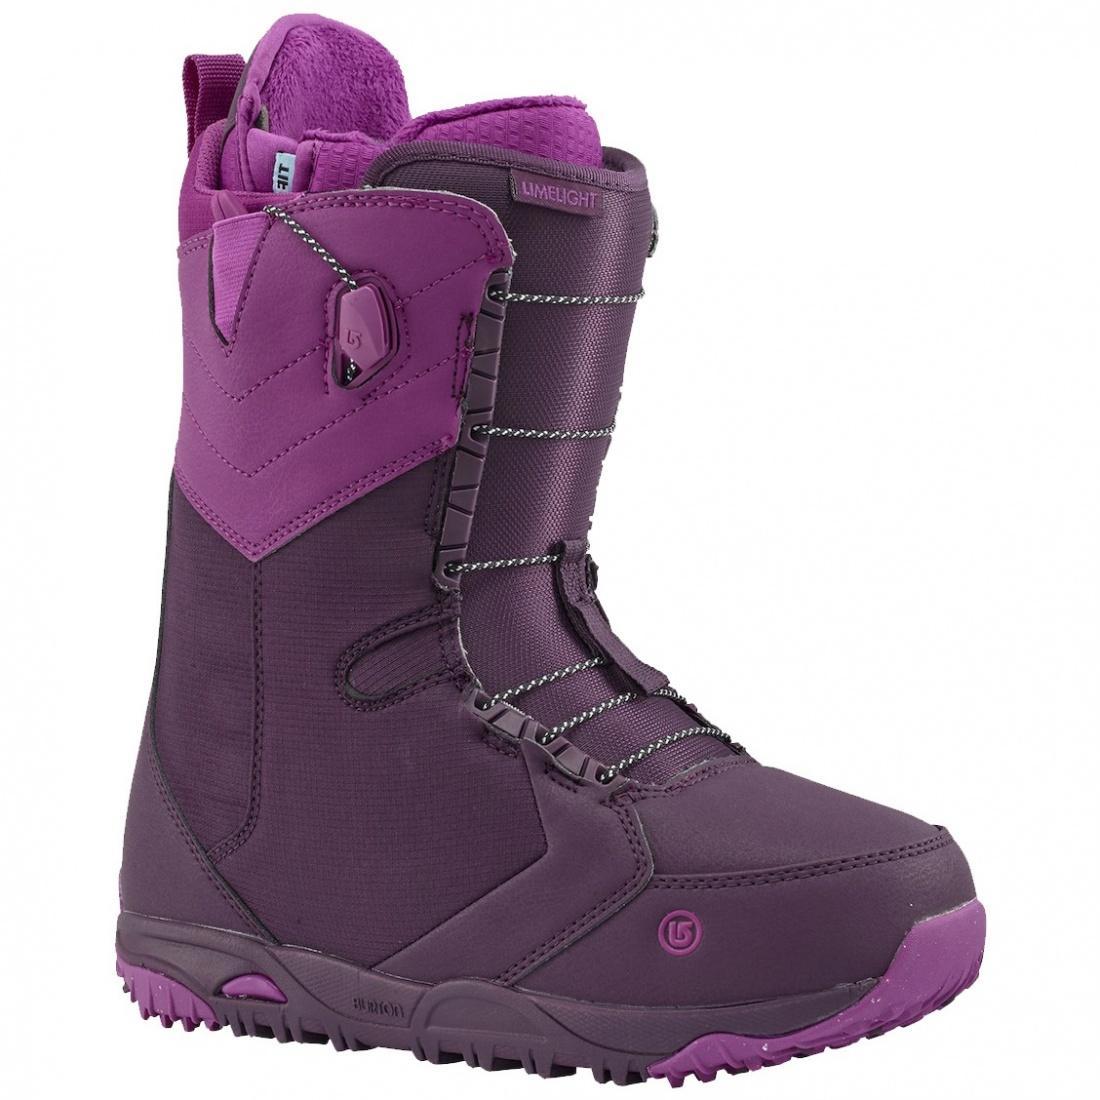 Ботинки для сноуборда Burton Limelight WHITE/SPECTRUM 8.5